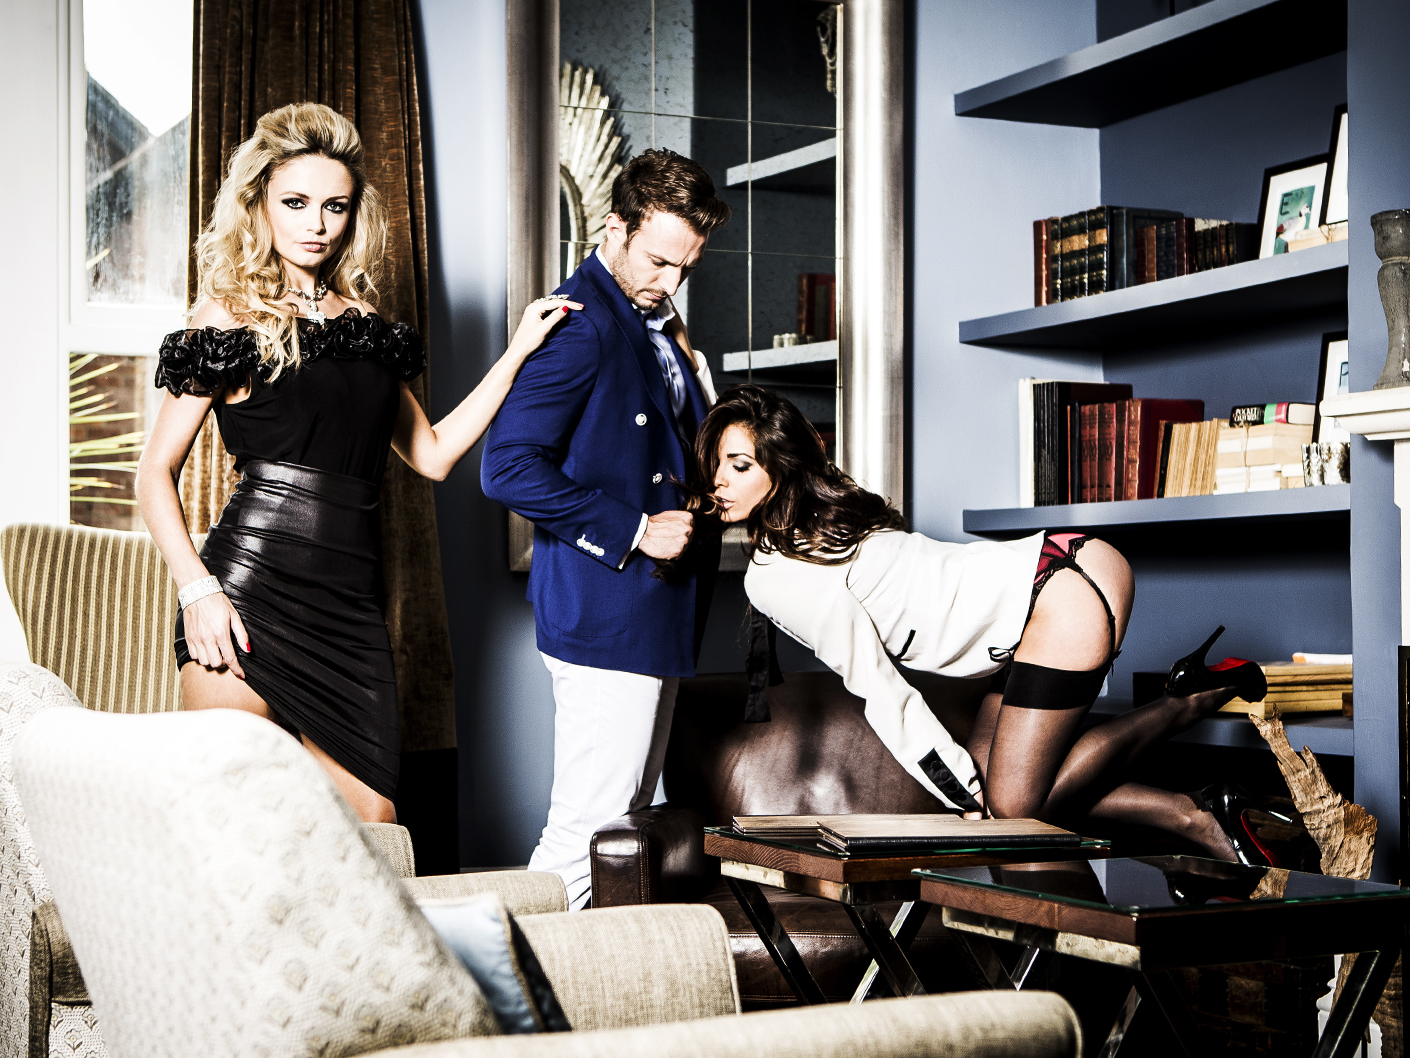 high-fashion-menswear-photography-in-manchester